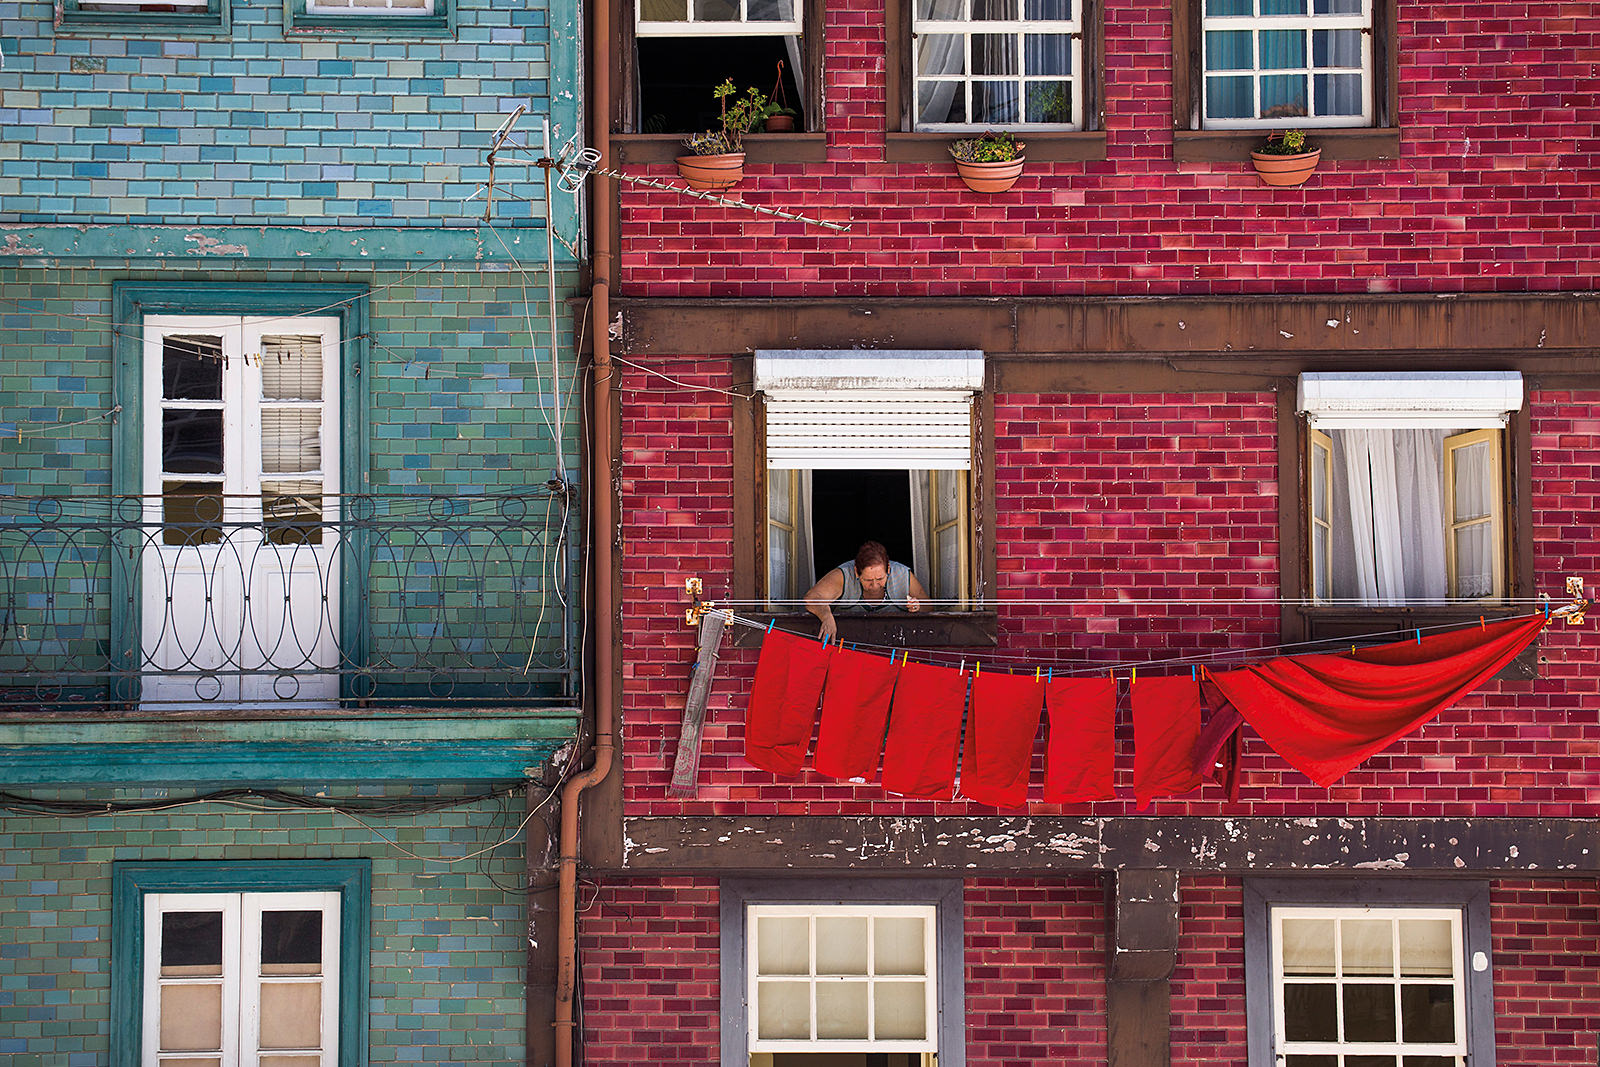 Farbkontraste im portugiesischen Porto; Foto: Holger Leue